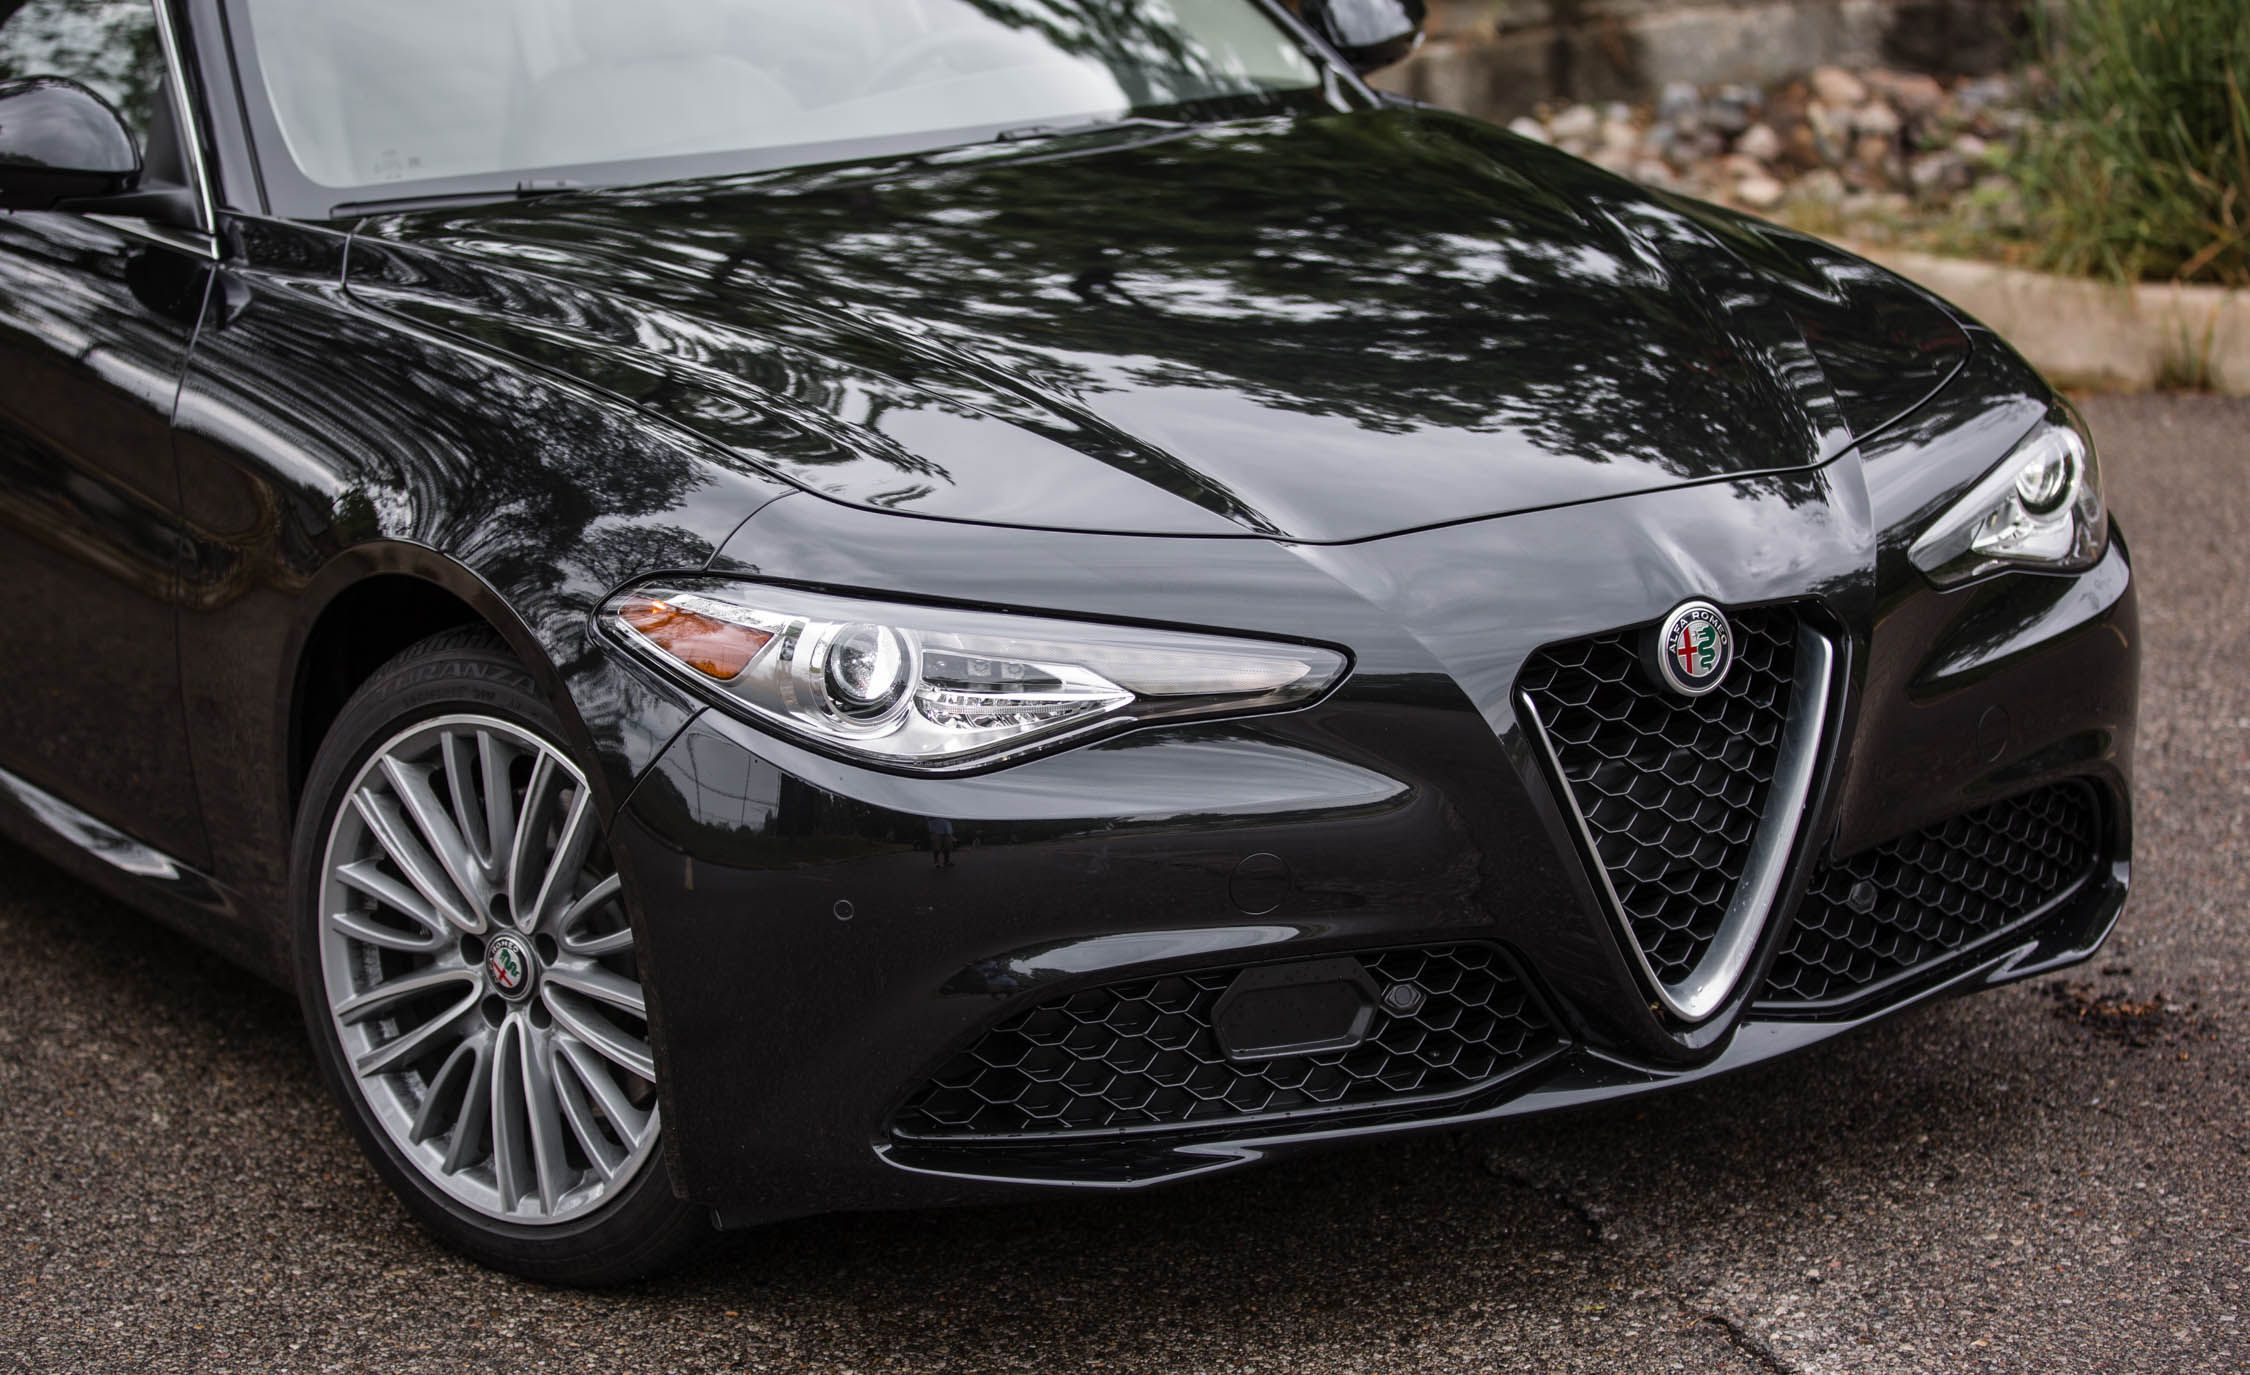 Alfa Romeo Giulia Reviews | Alfa Romeo Giulia Price, Photos, and ...